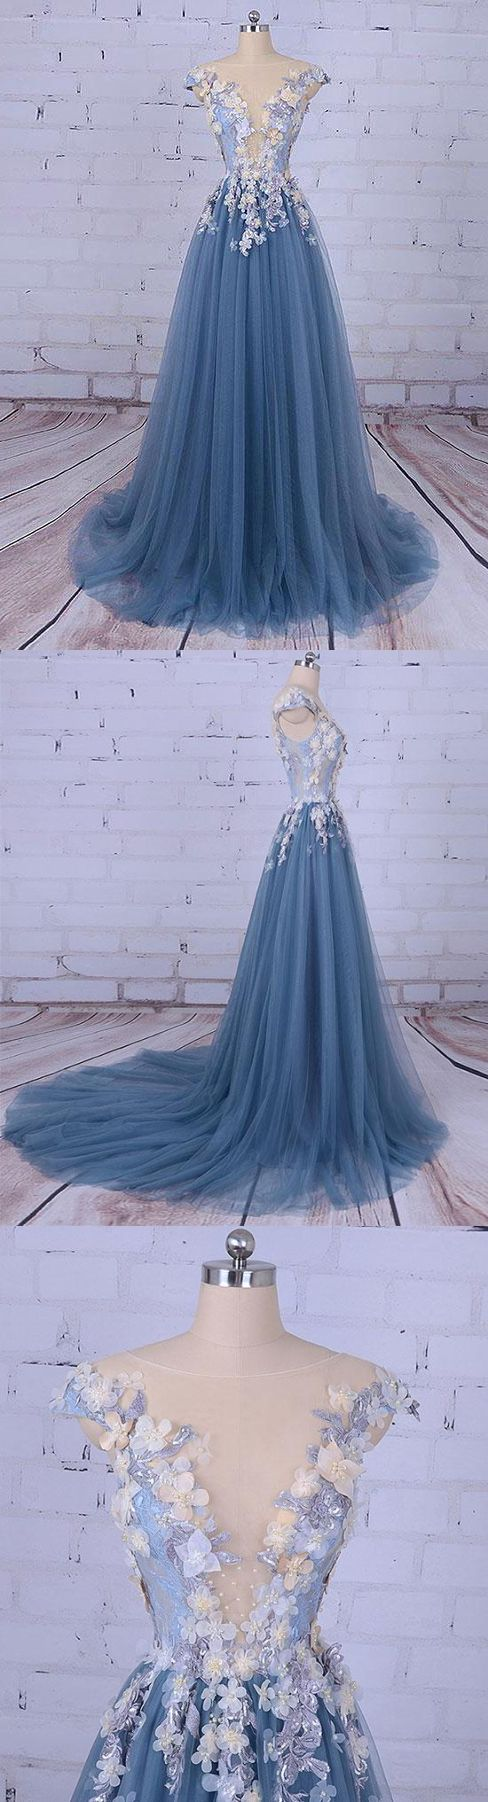 Beautiful prom dresses scoop aline sweepbrush train long prom